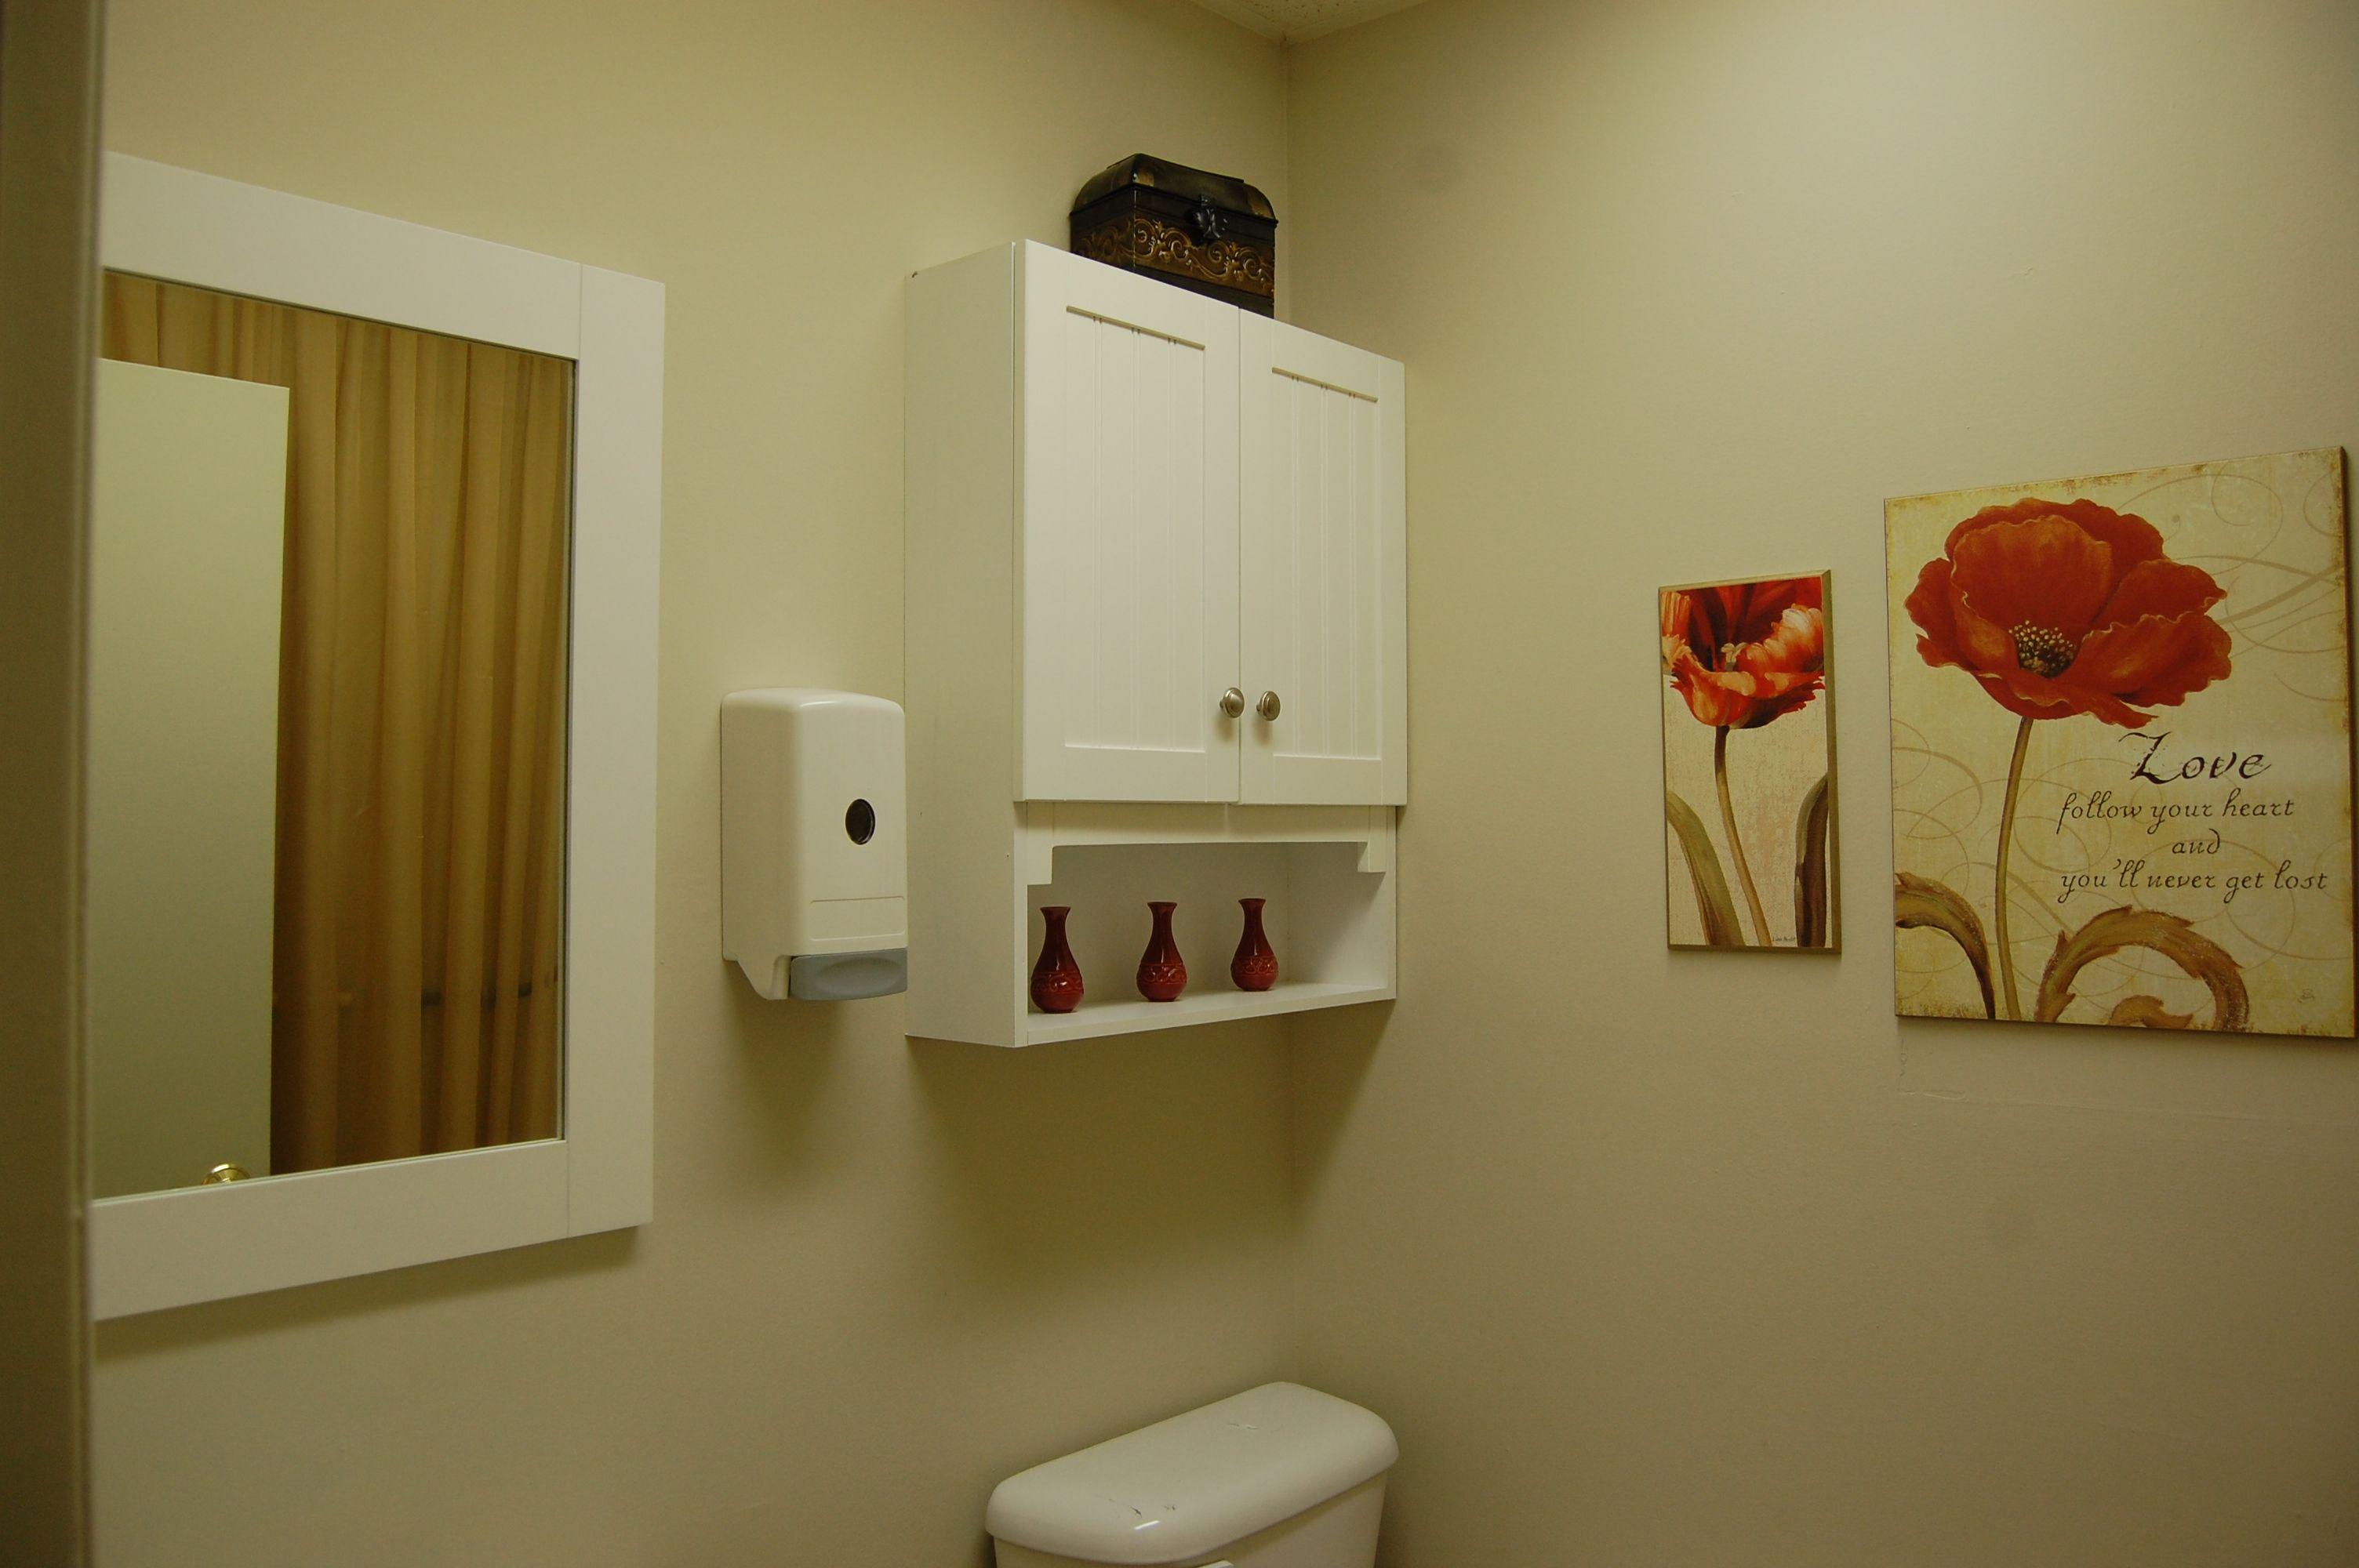 doctor office decor. doctoru0027s office restroom doctor decor pinterest doctors waiting rooms and room